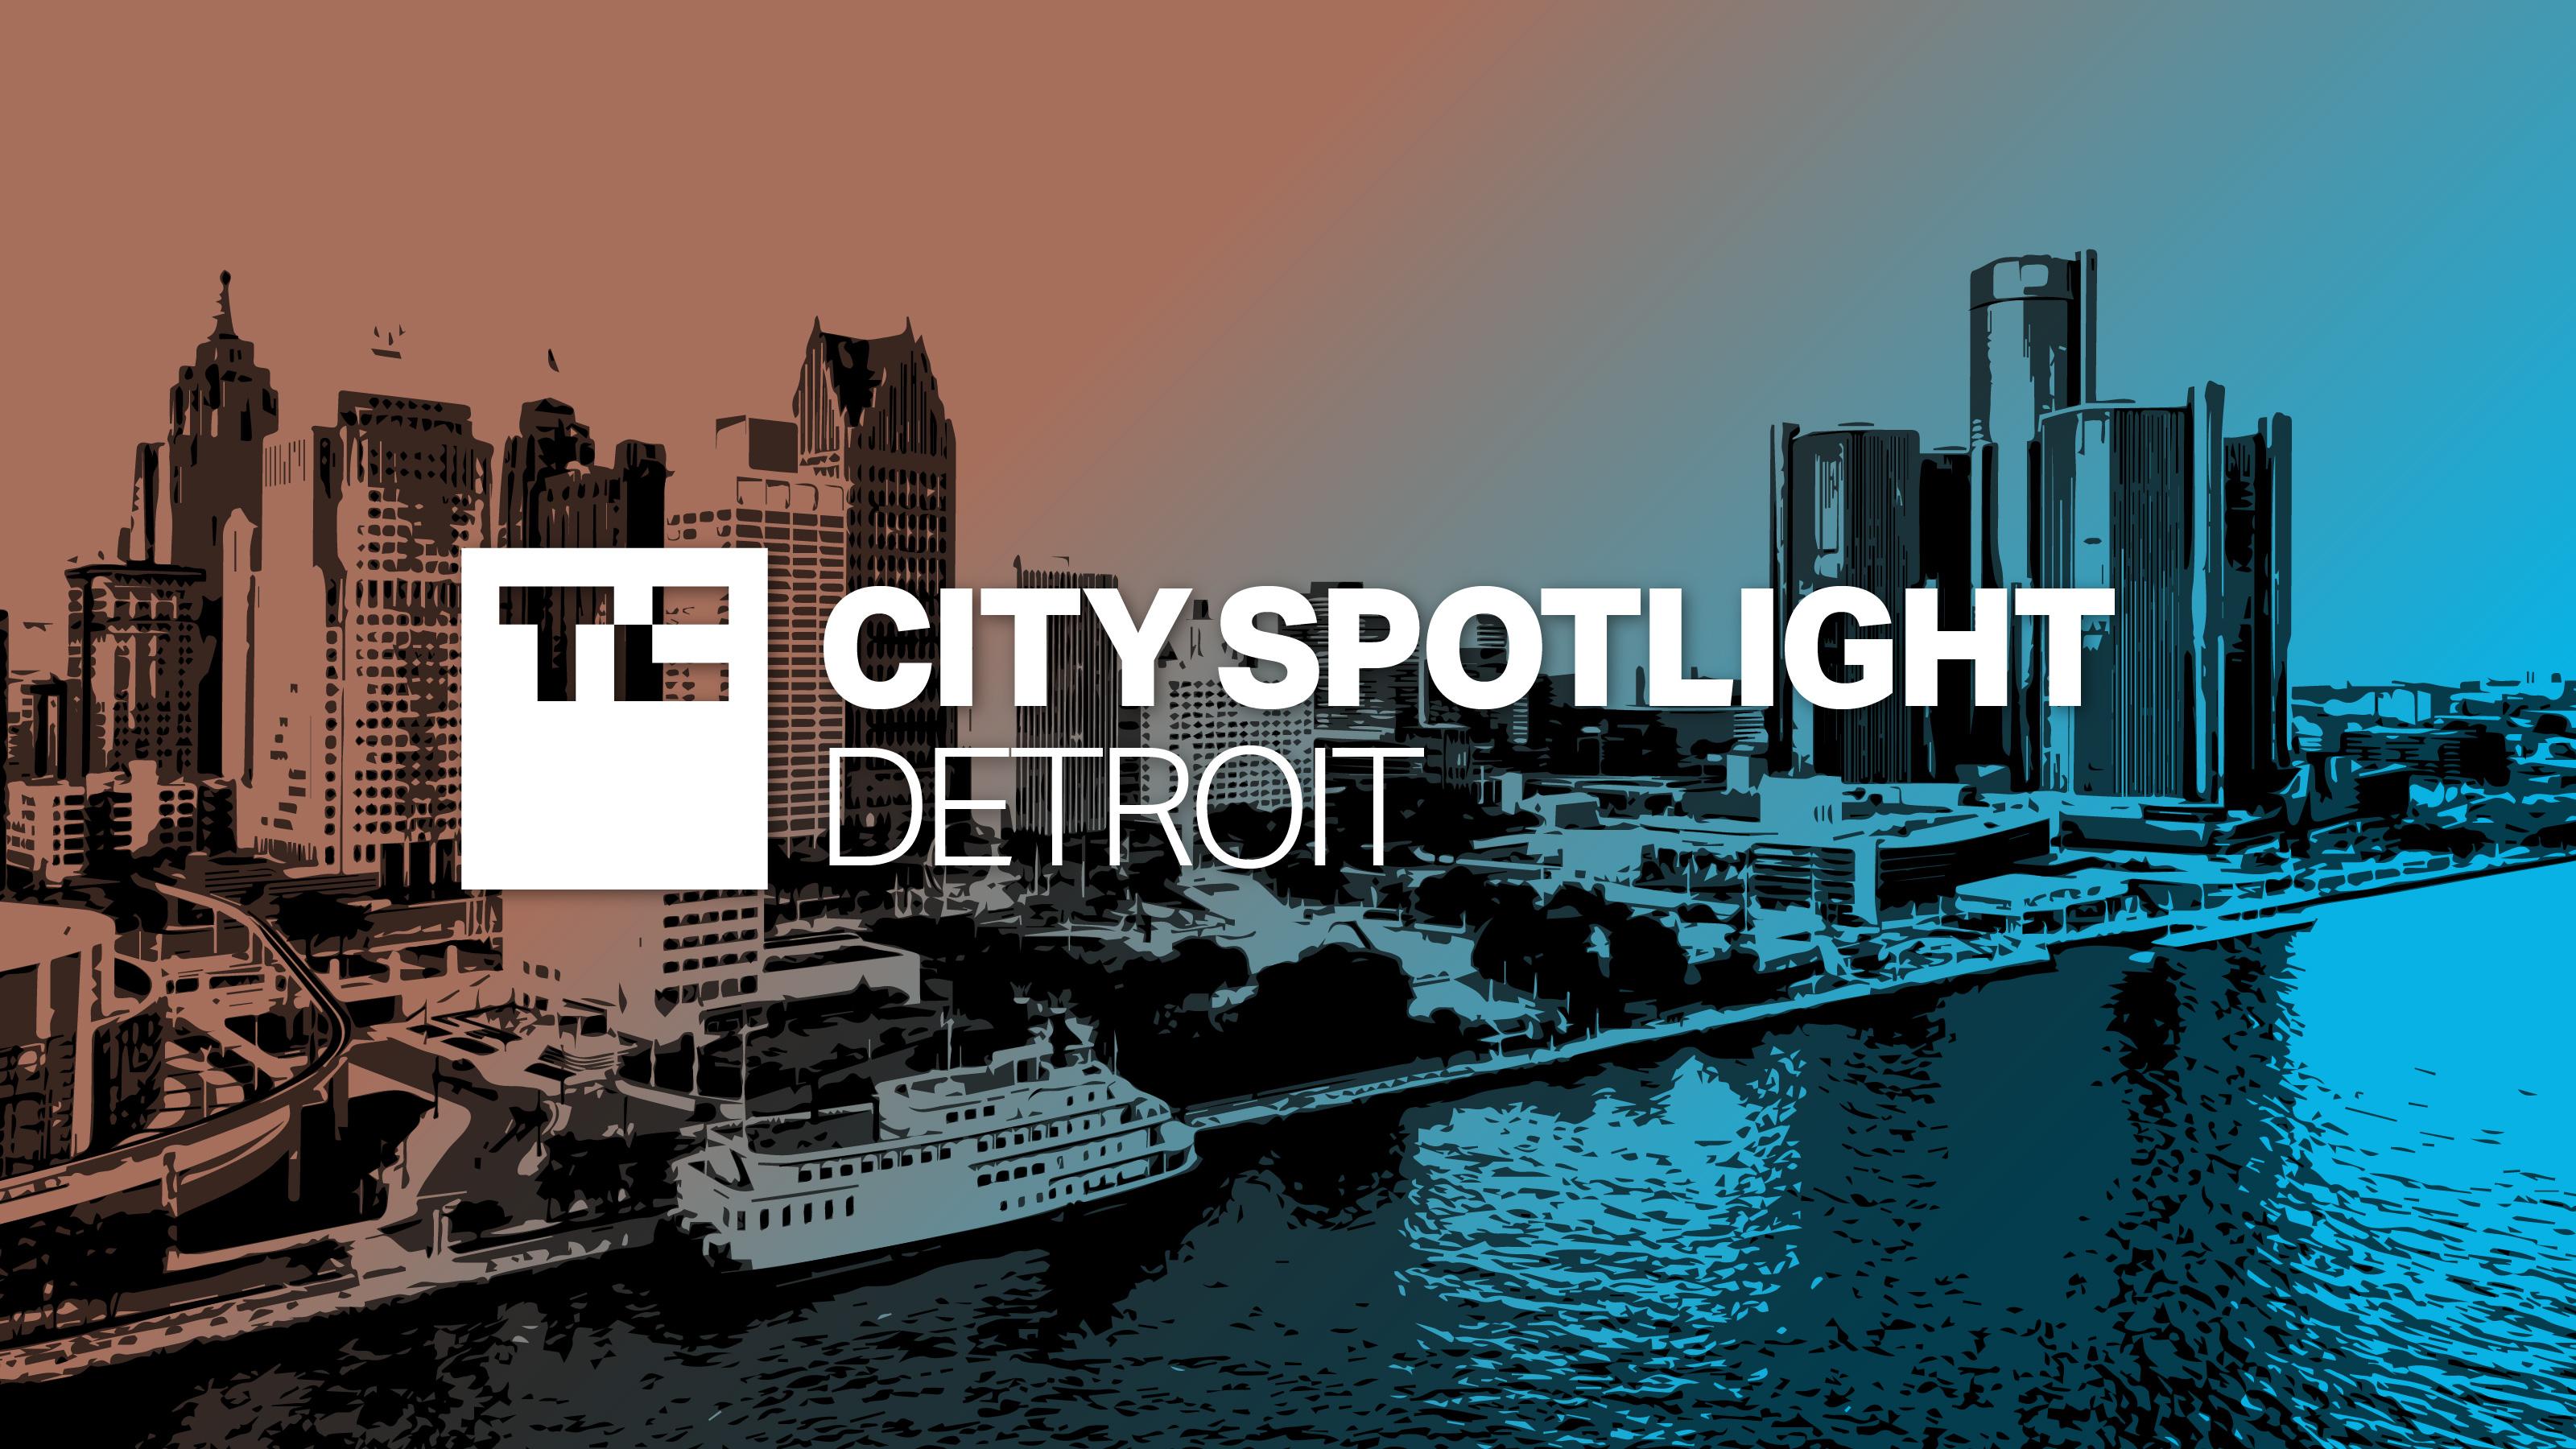 Detroit City Spotlight logo over photo illustration of downtown Detroit